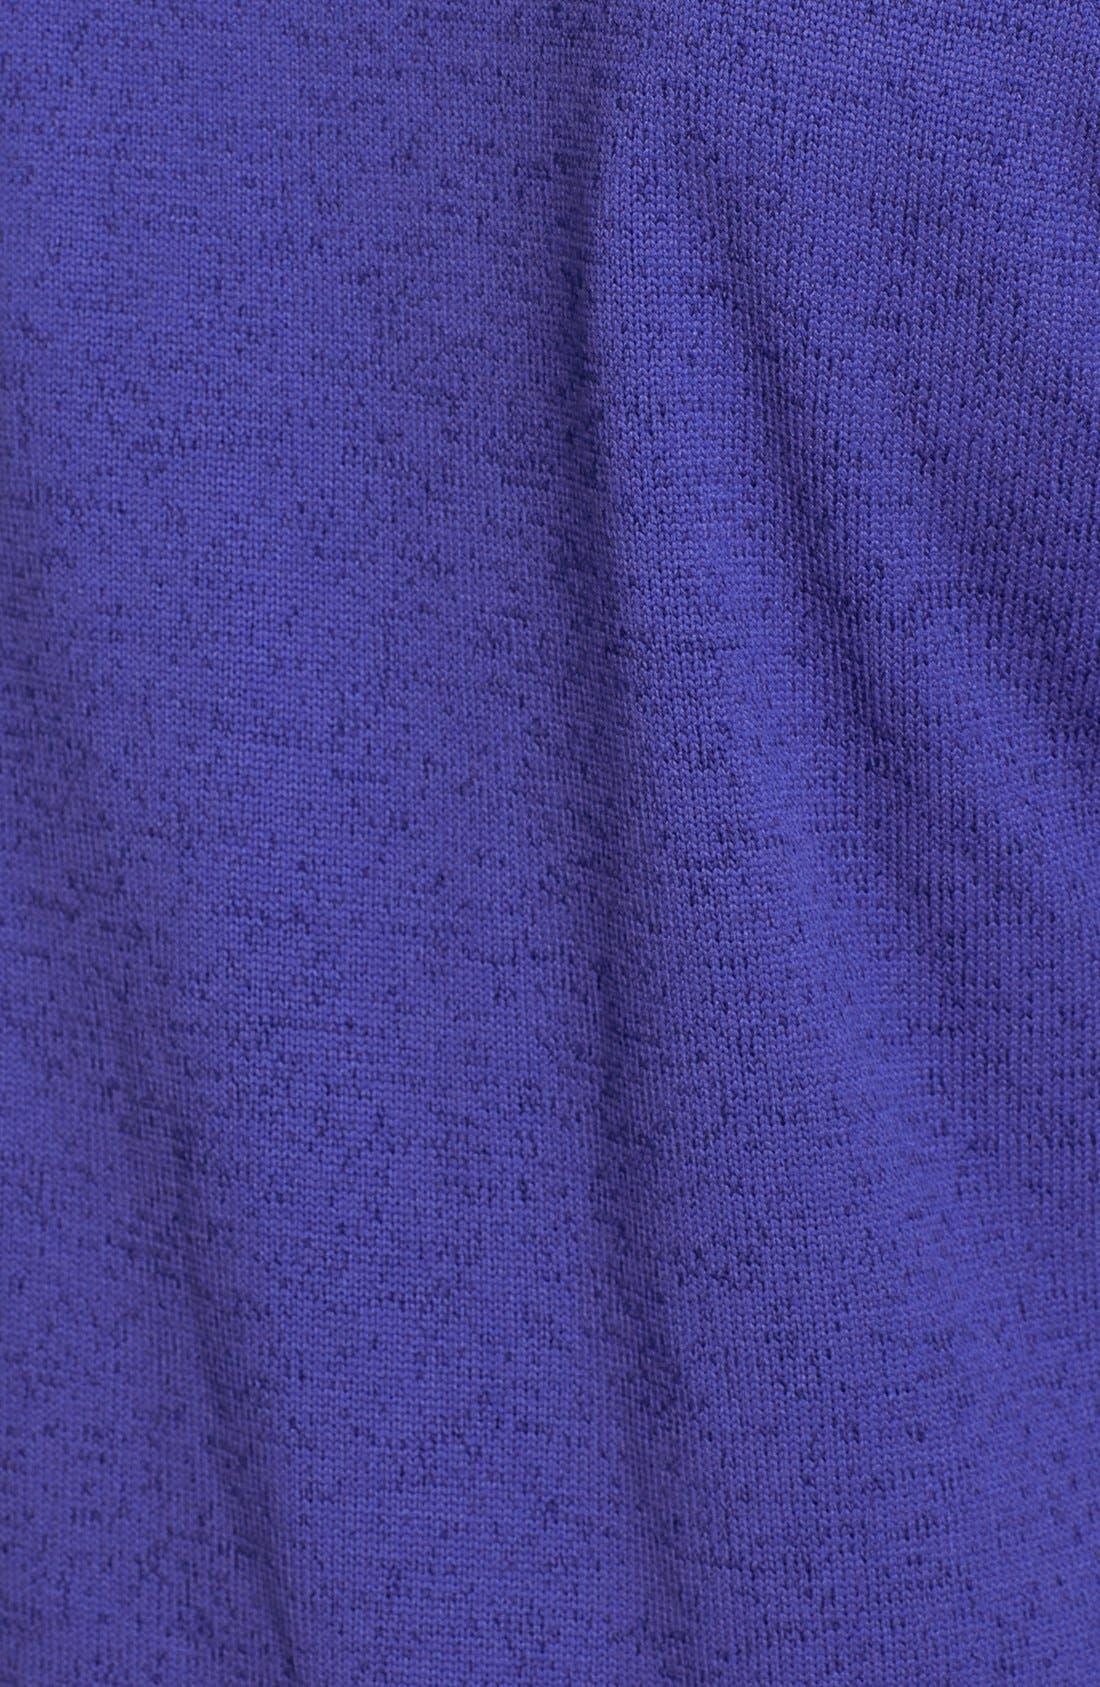 Alternate Image 3  - Roxy 'Switch It Up' Fleece Jacket